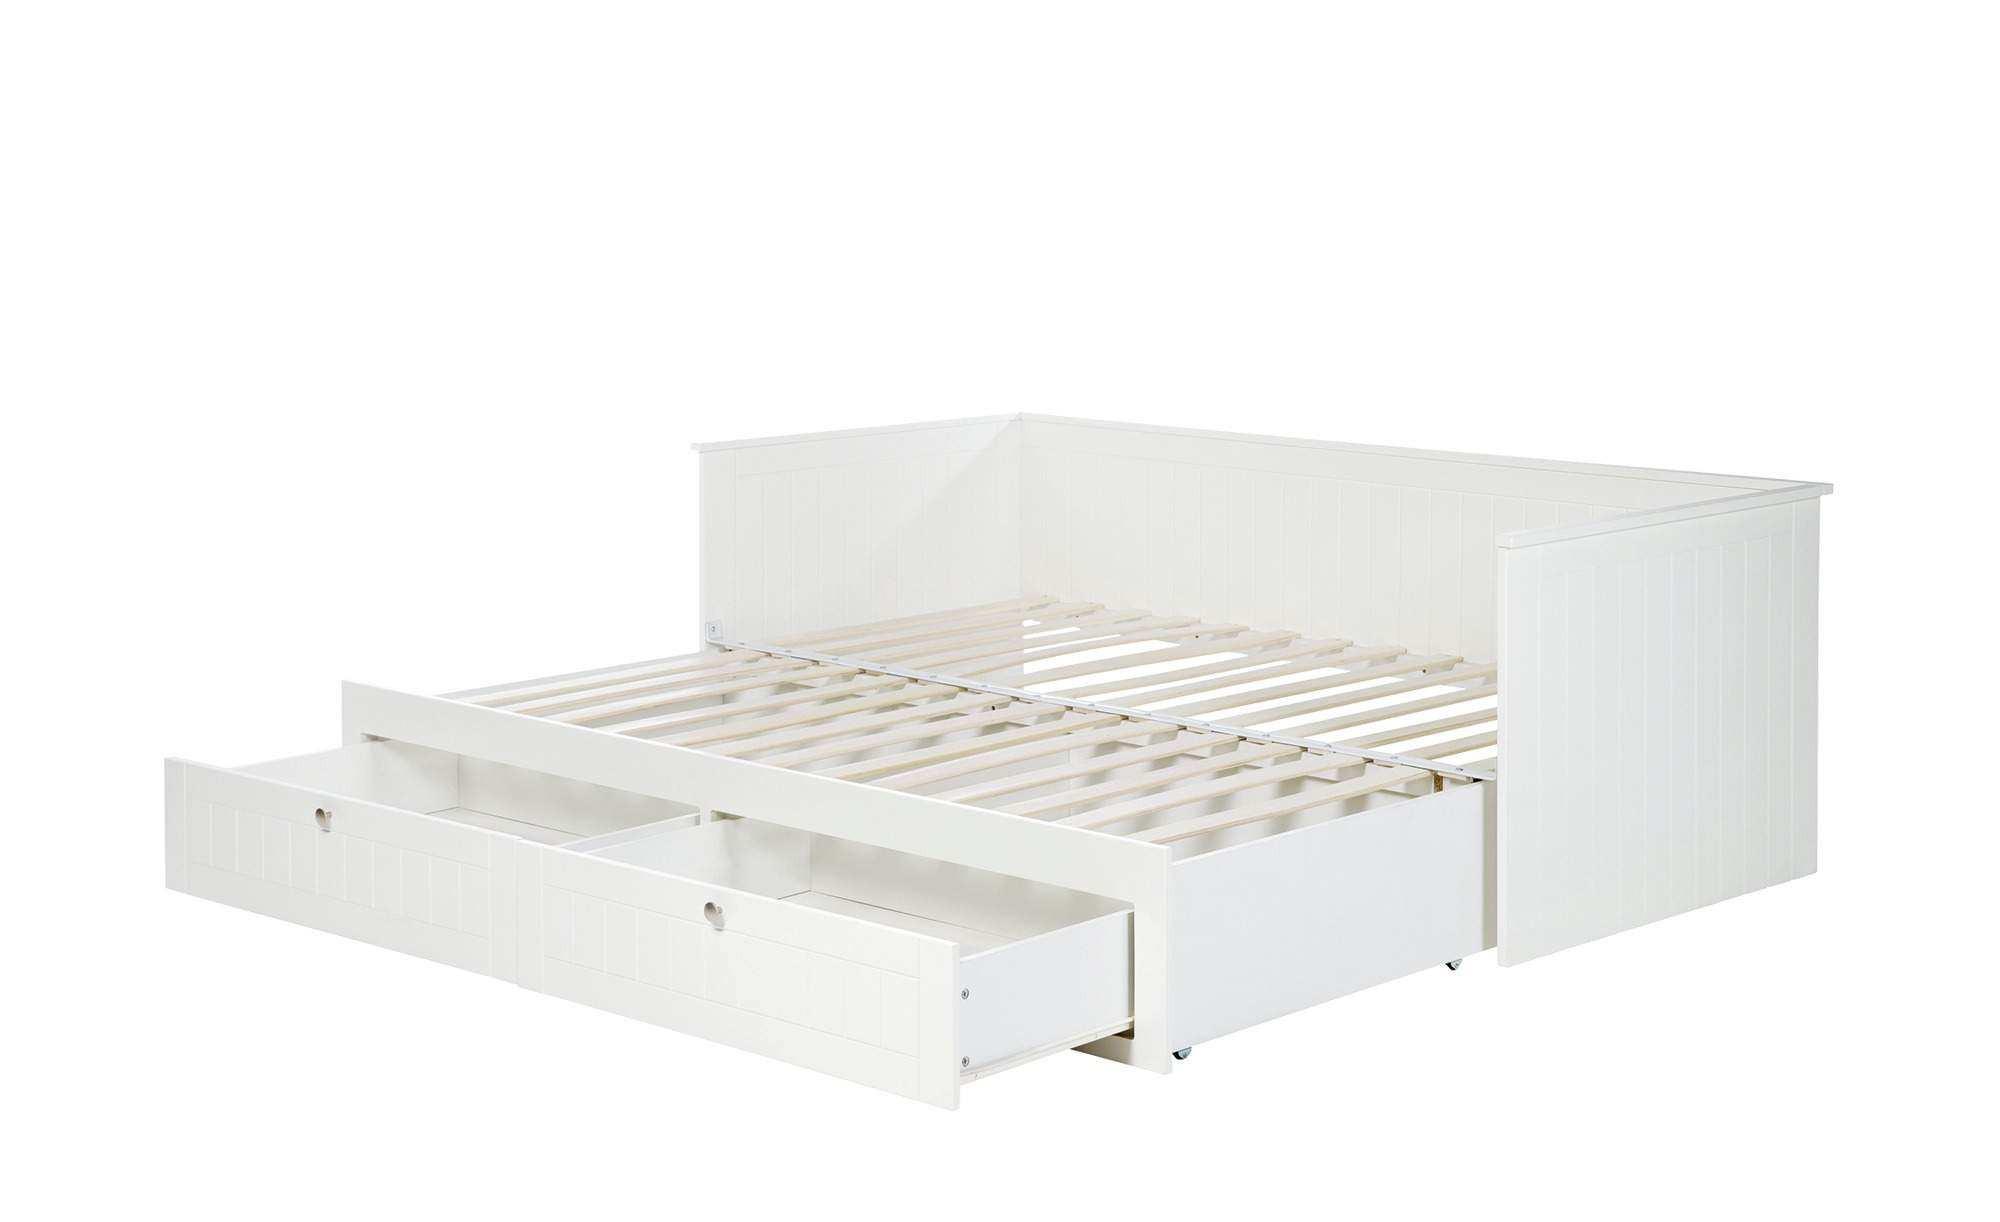 Full Size of Bett Ausziehbar Gleiche Ebene Ikea Doppelbett Watersoftnerguide Gp Fhrung Beste Betten 140x200 Aus Holz 160x200 Komplett Günstige 180x200 Clinique Even Better Wohnzimmer Bett Ausziehbar Gleiche Ebene